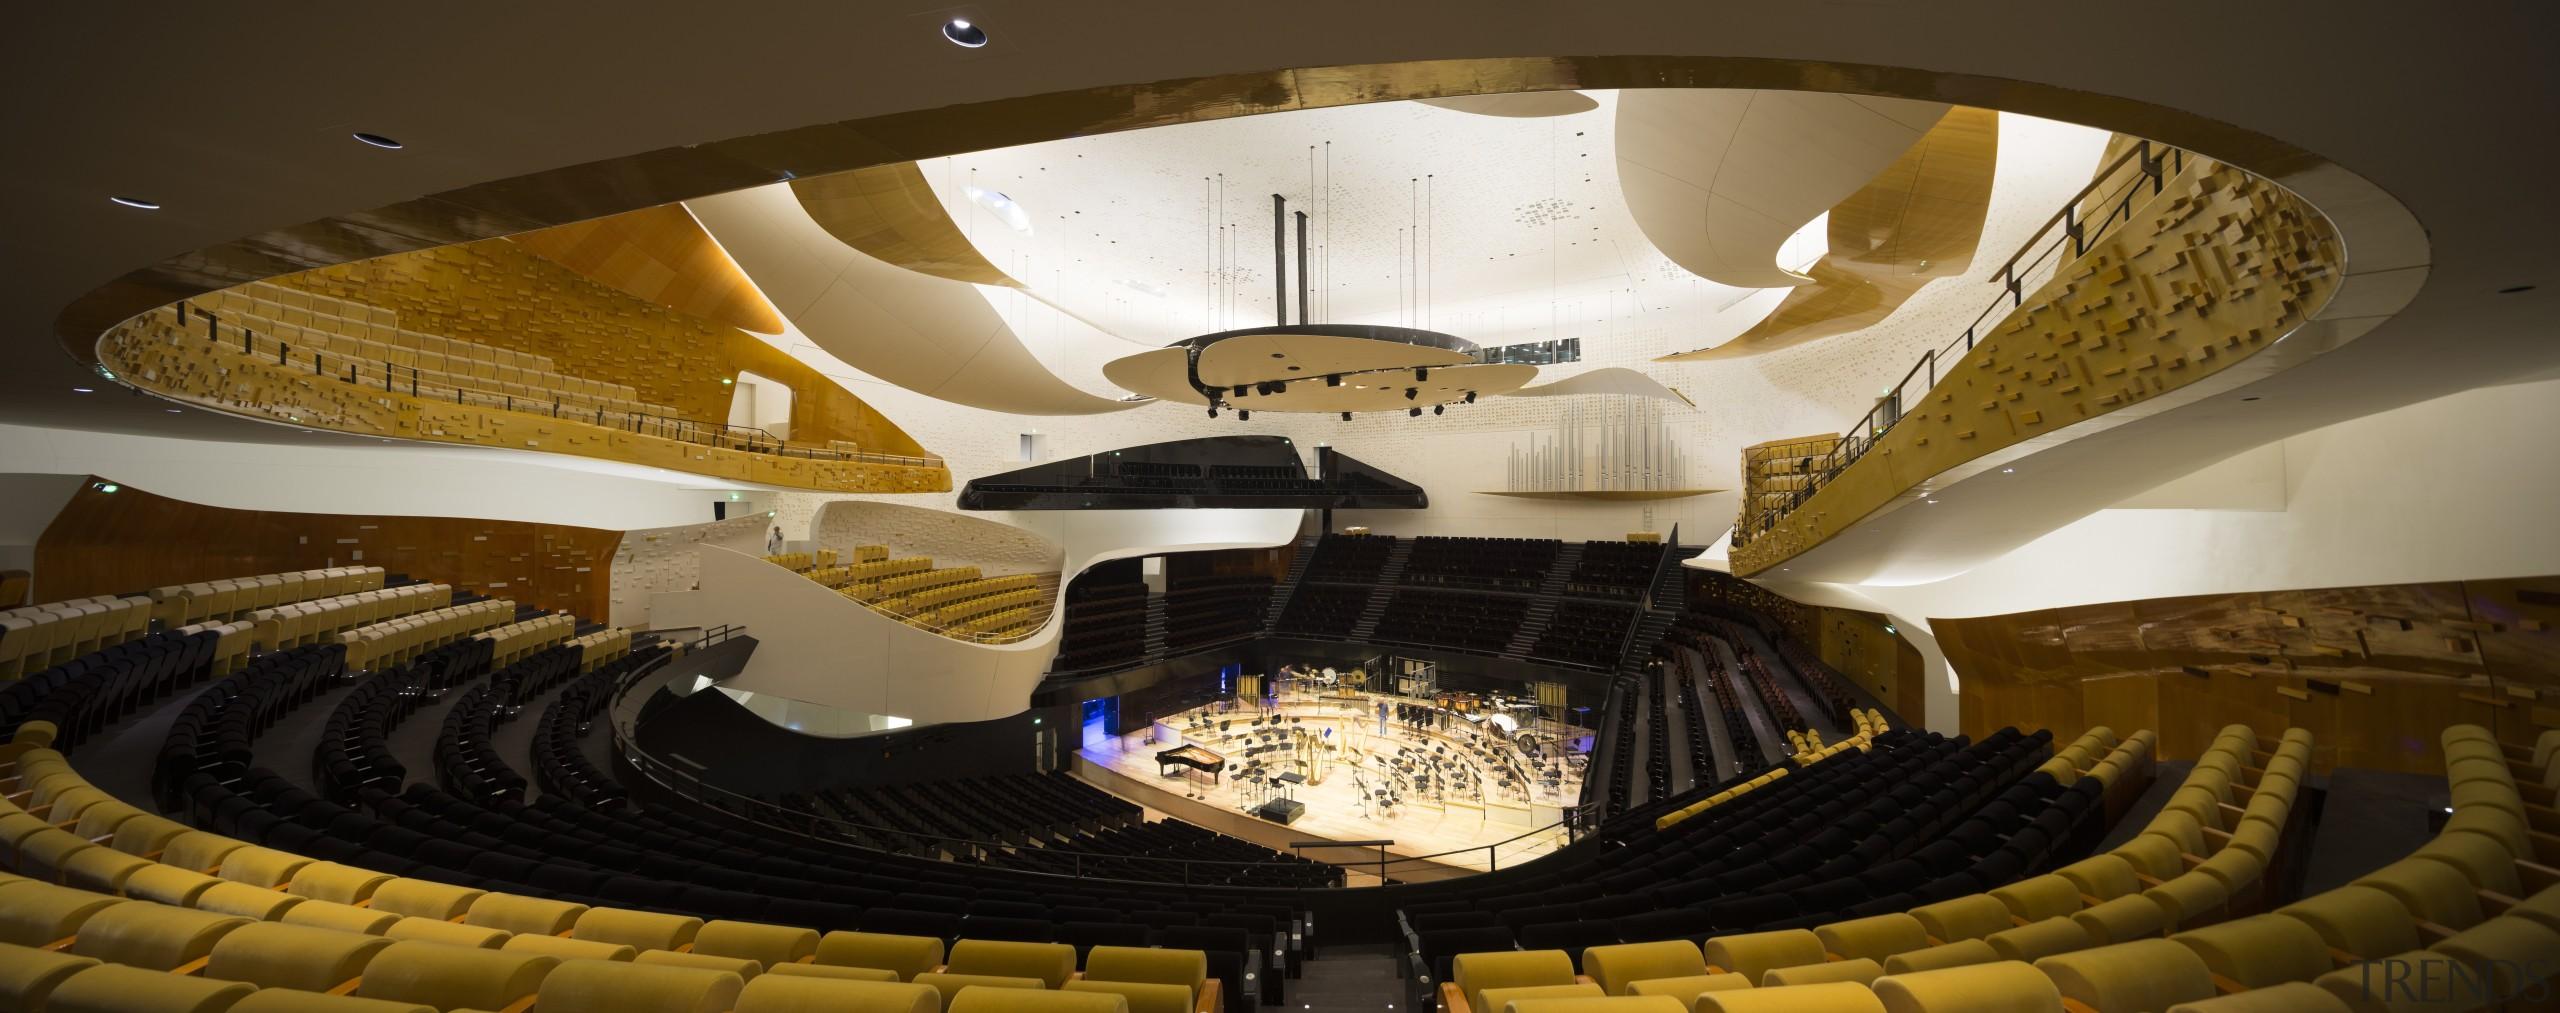 The auditorium at the Philharmonie de Paris was architecture, auditorium, ceiling, light, lighting, performing arts center, theatre, tourist attraction, yellow, brown